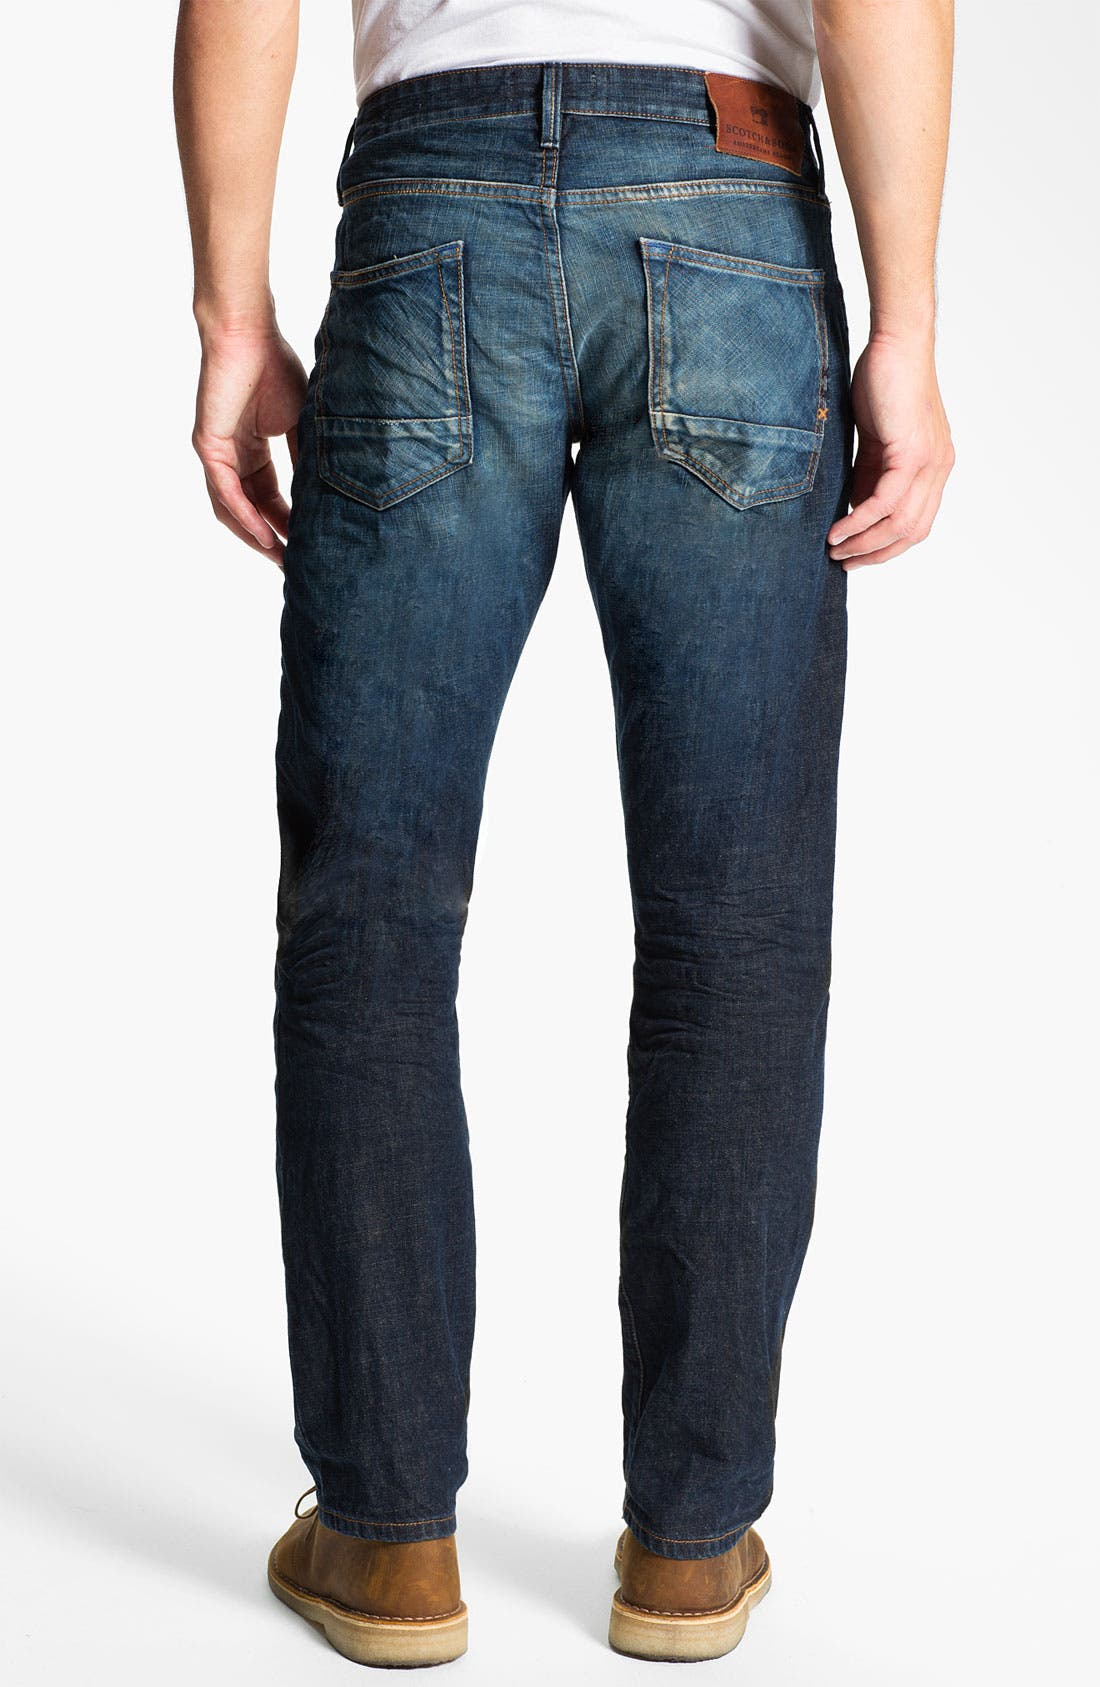 Main Image - Scotch & Soda 'Ralston' Slim Straight Leg Jeans (Blue Buzz)